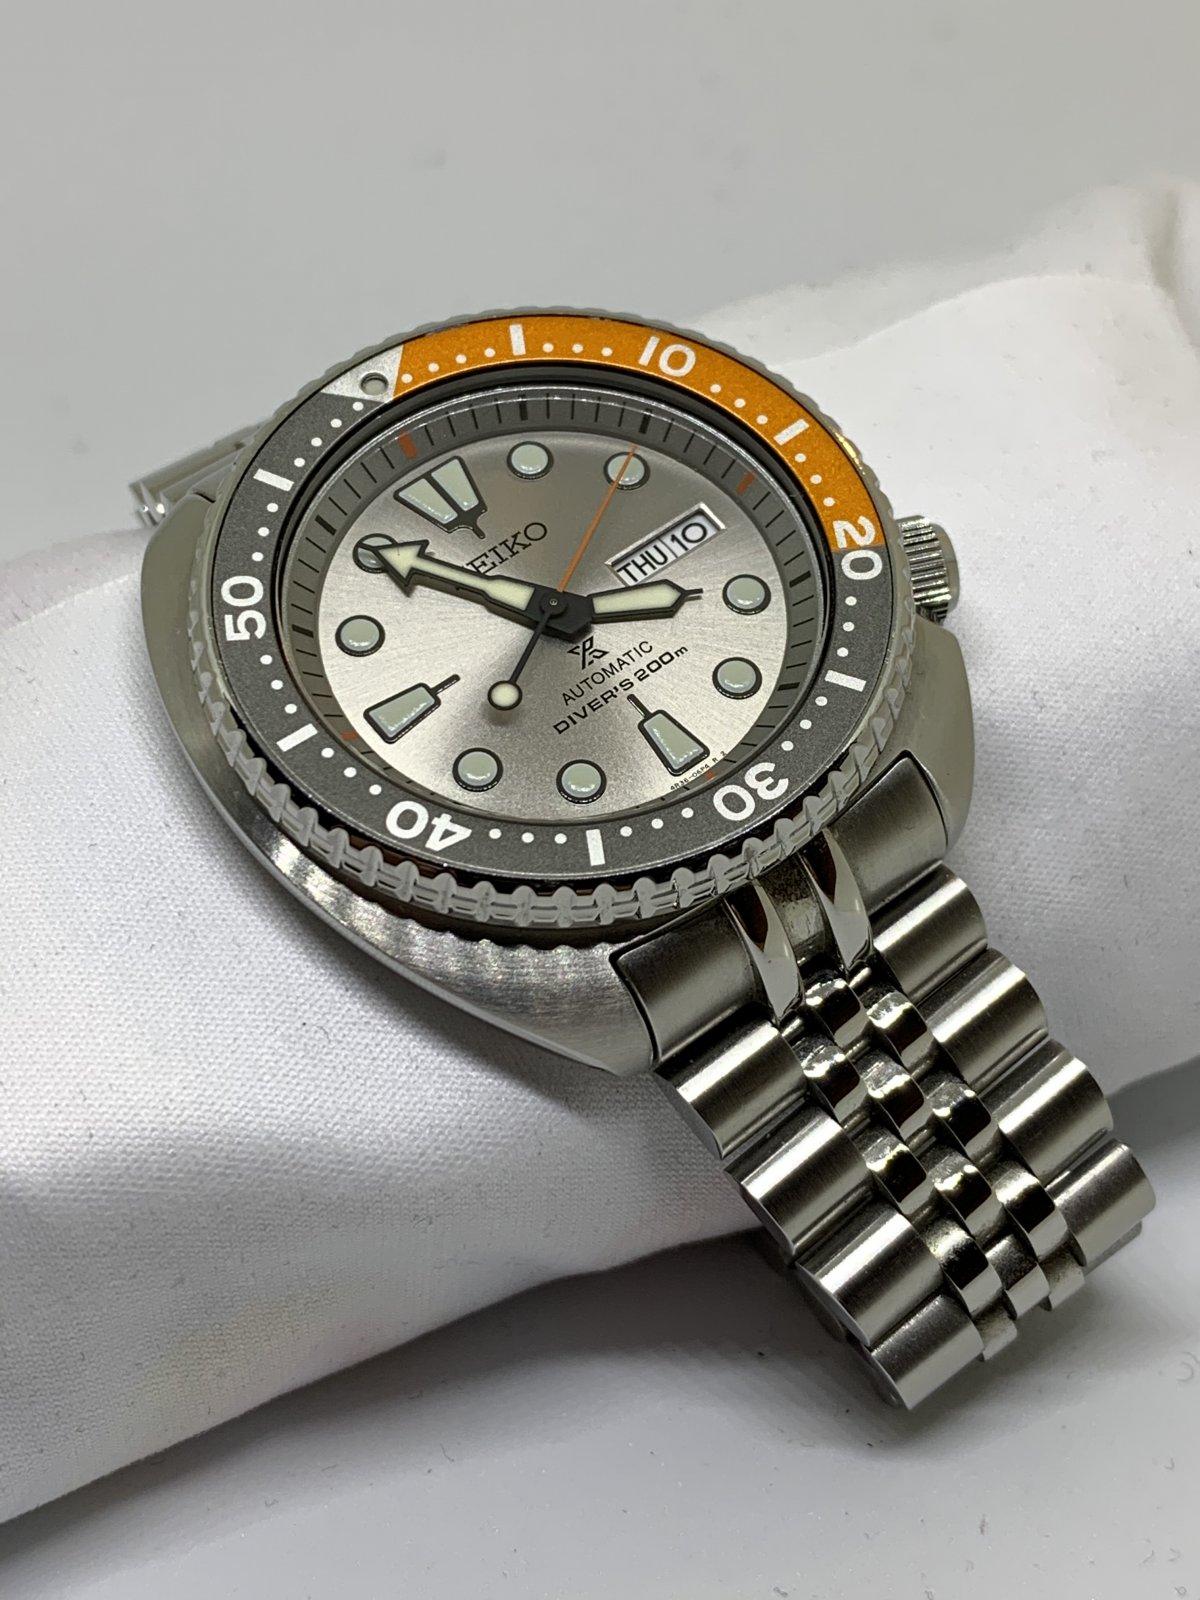 73DEBE2B-C738-4874-A90F-6C130DF86244.jpeg